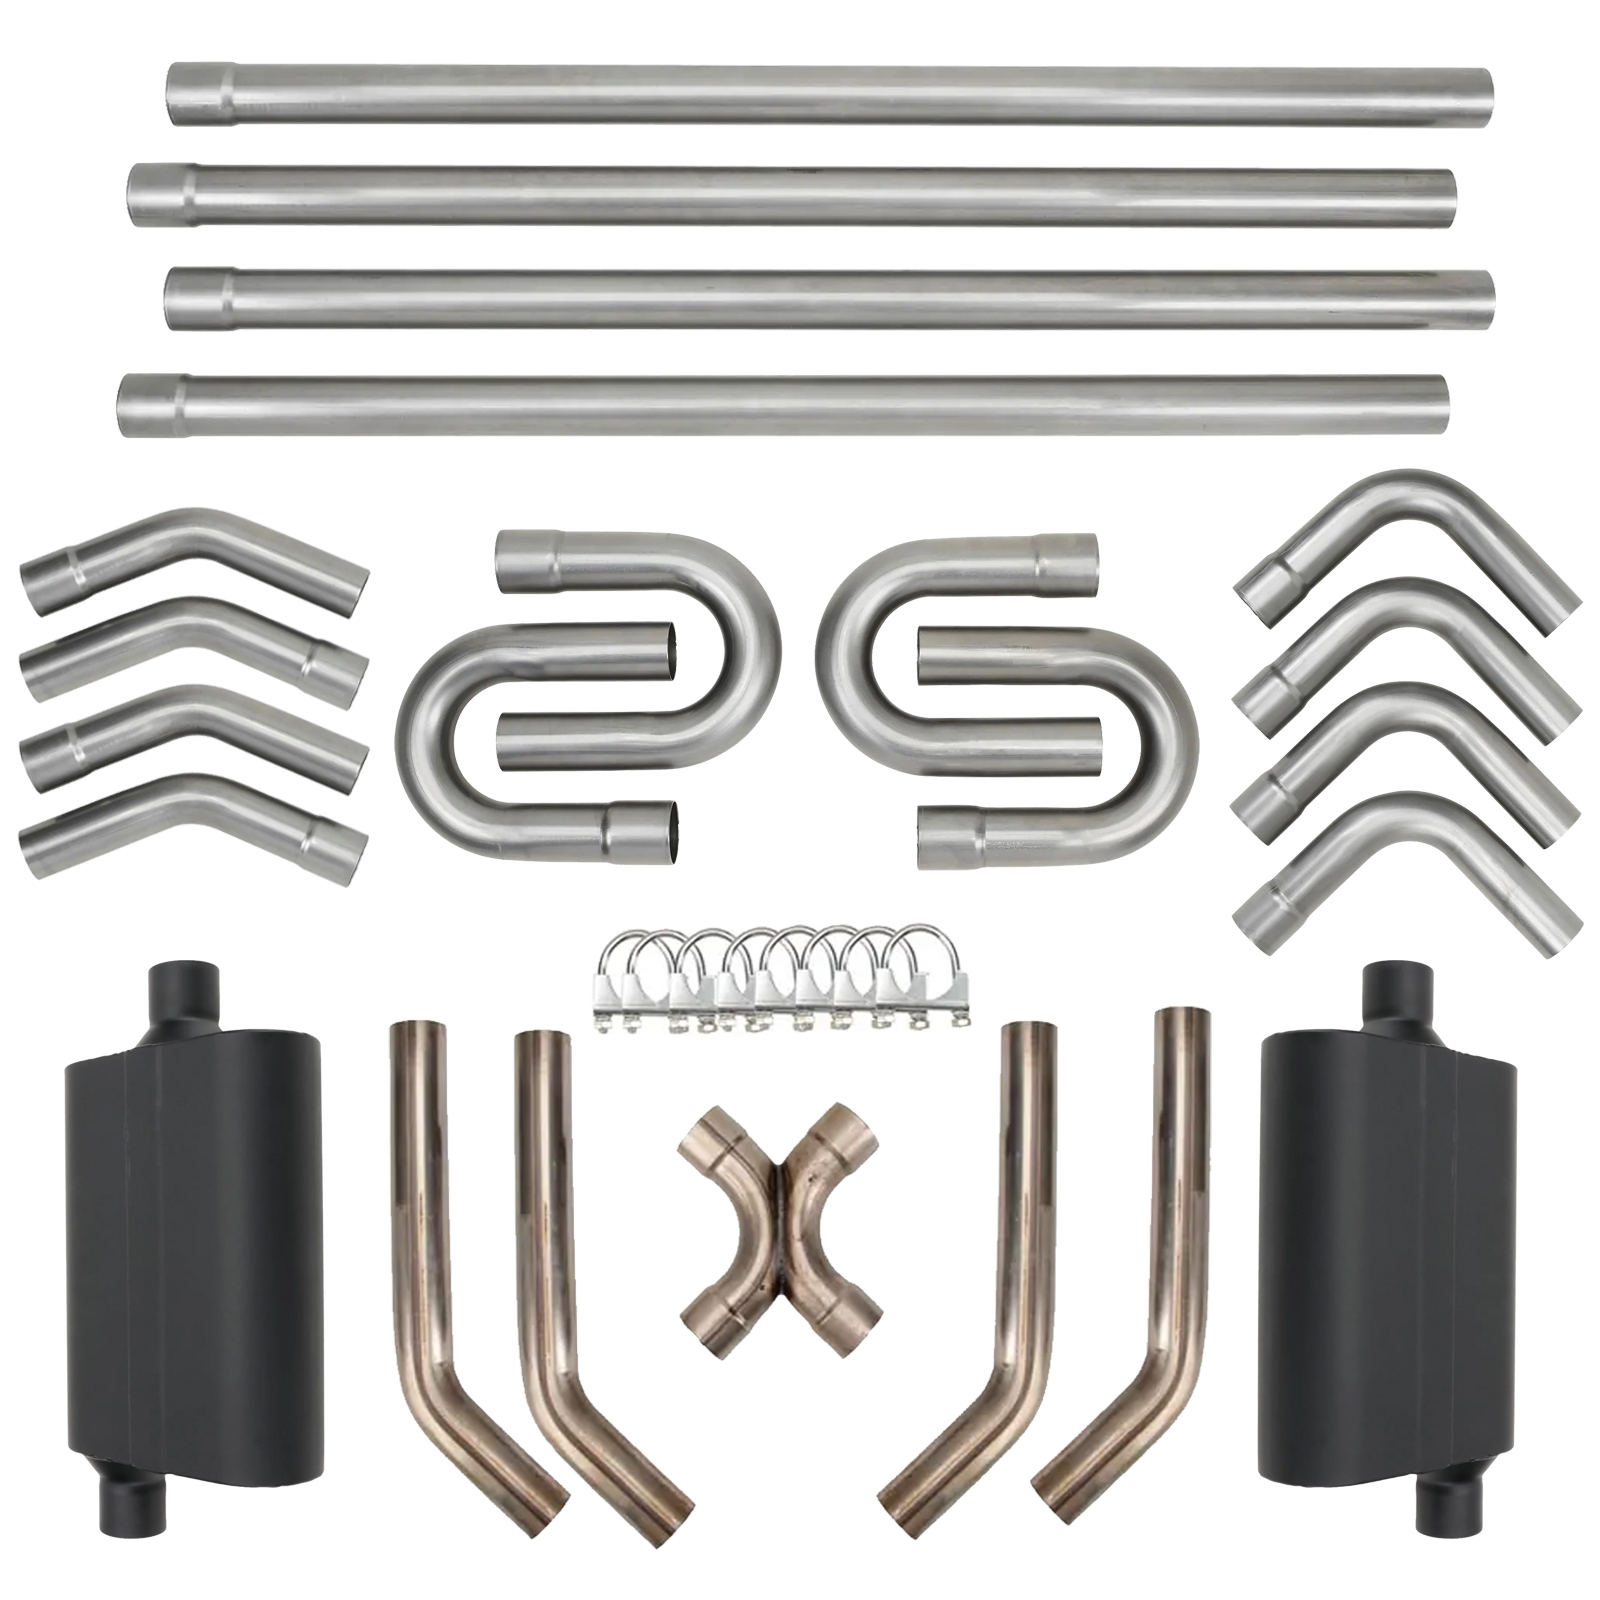 diy universal dual exhaust system kit w x pipe mufflers 2 1 4